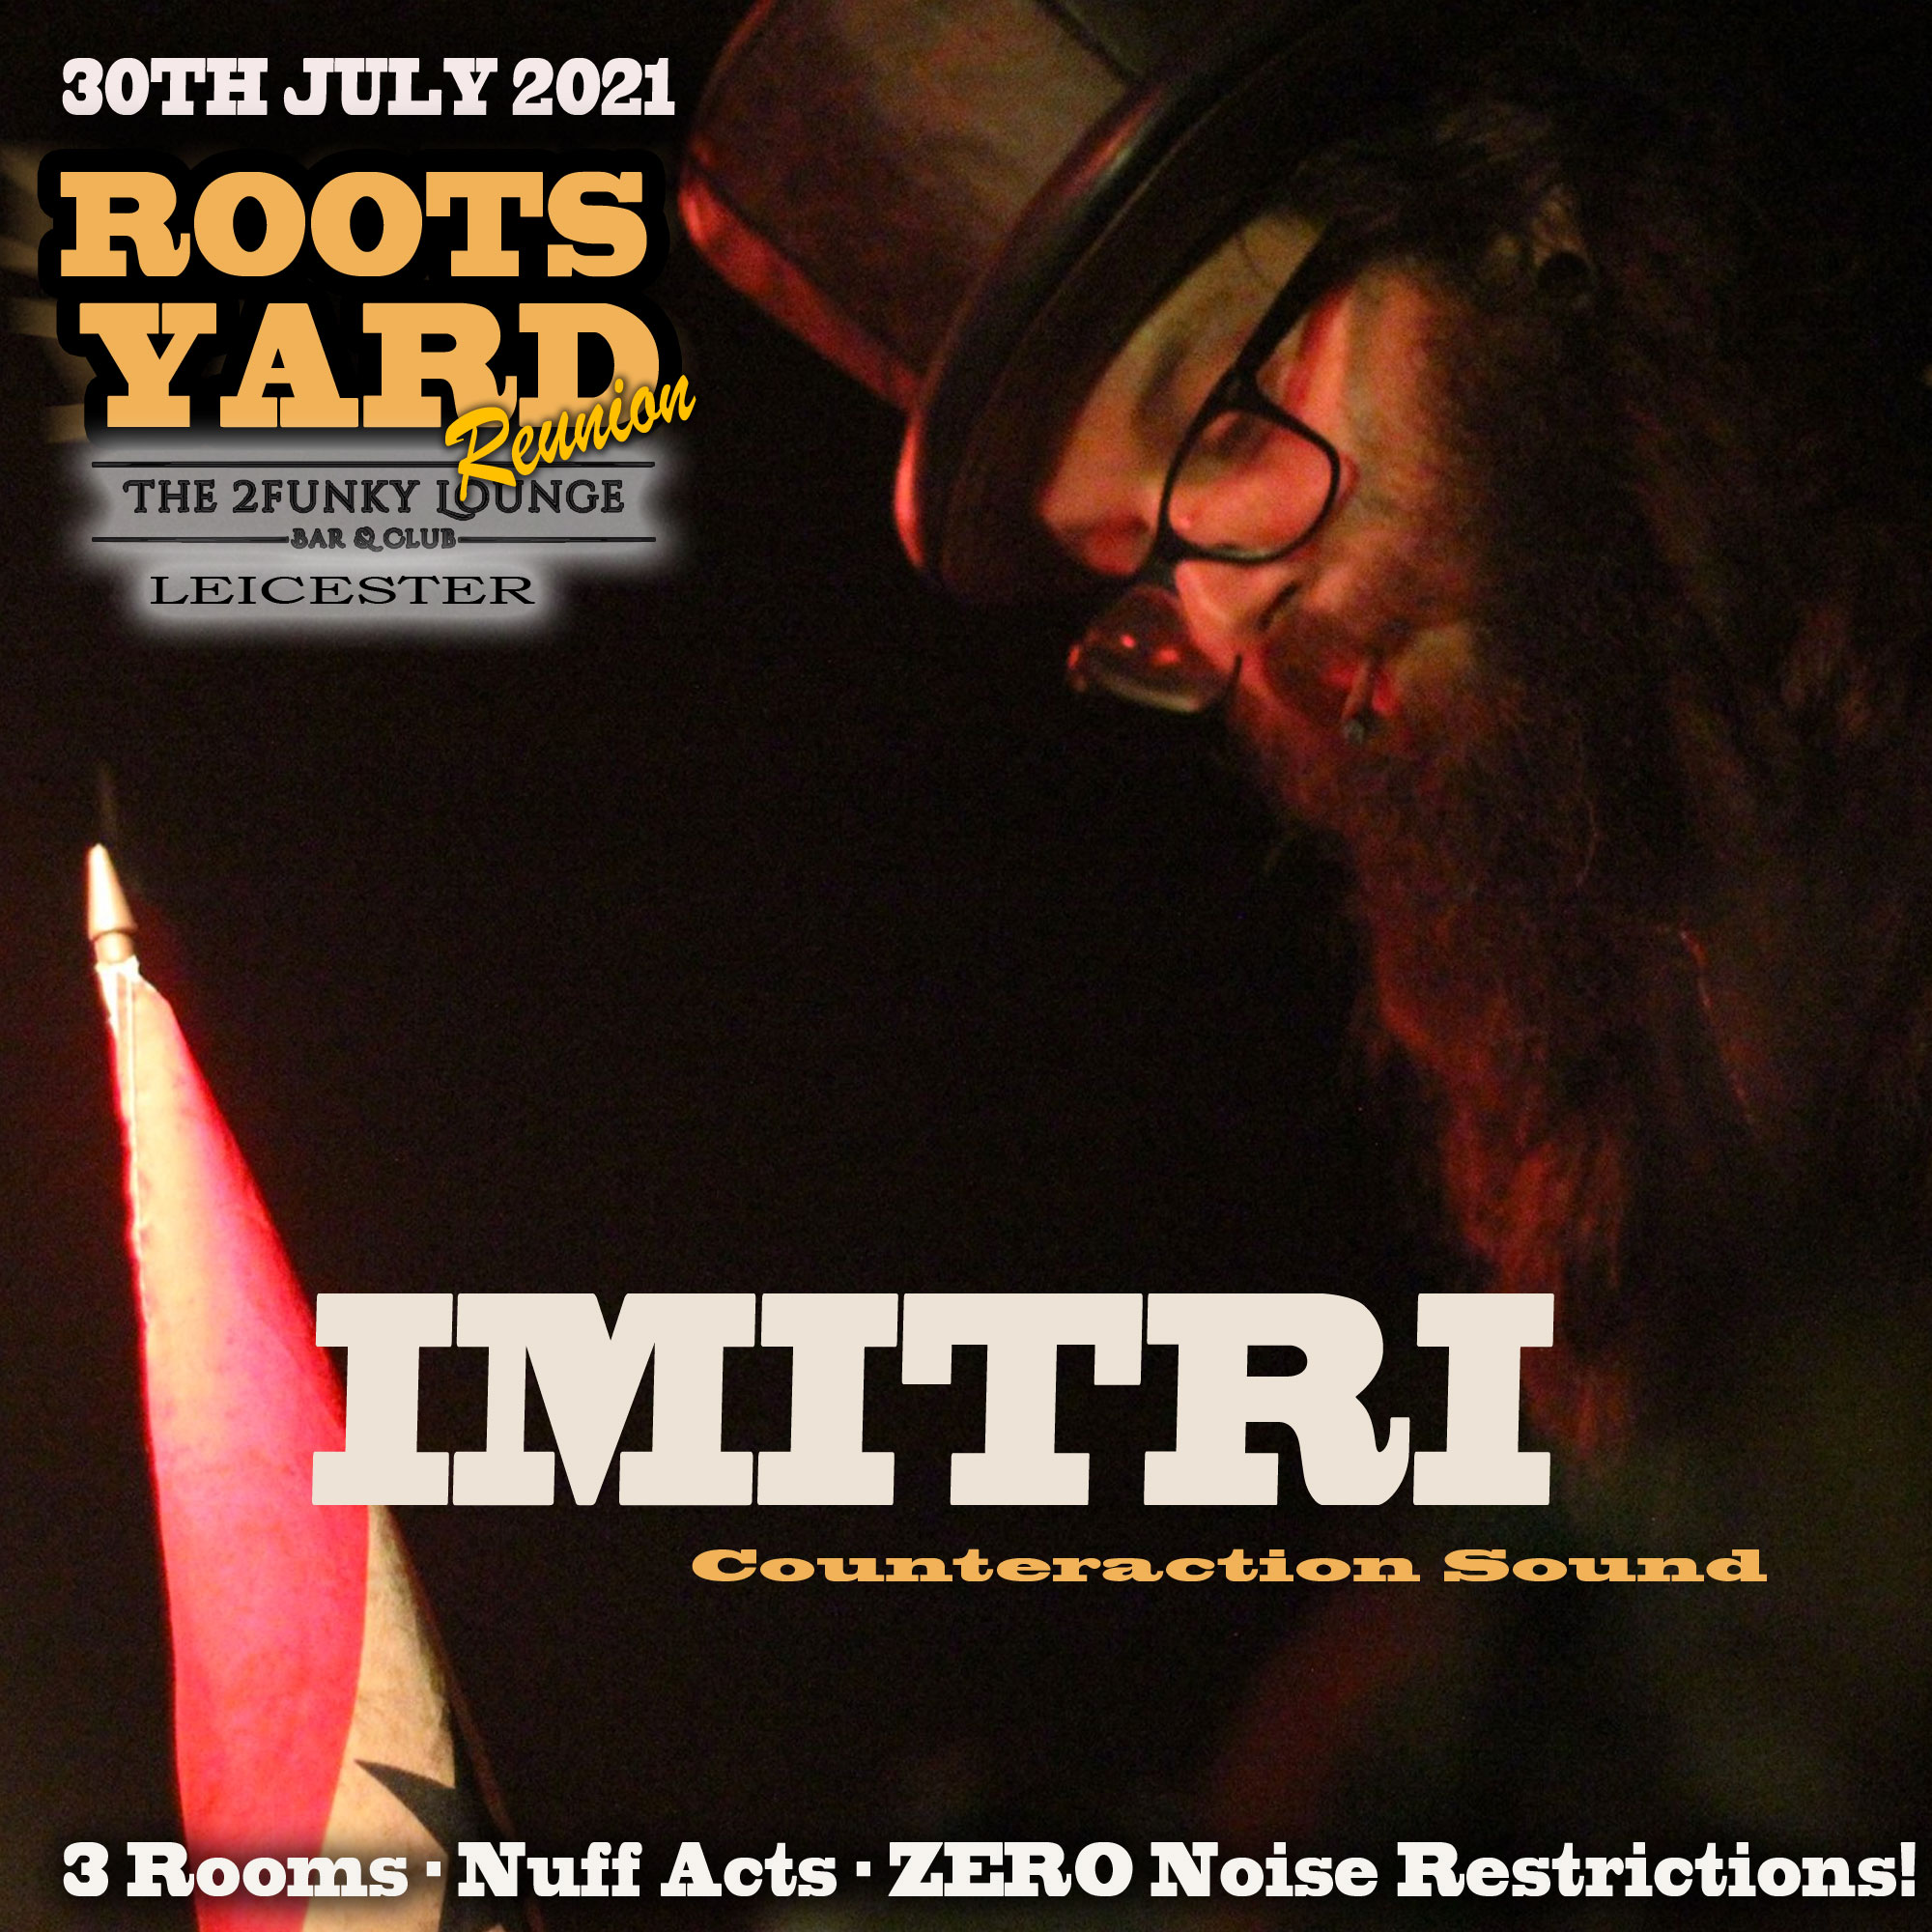 IMITIRI---roots-yard-reunion-insta-post